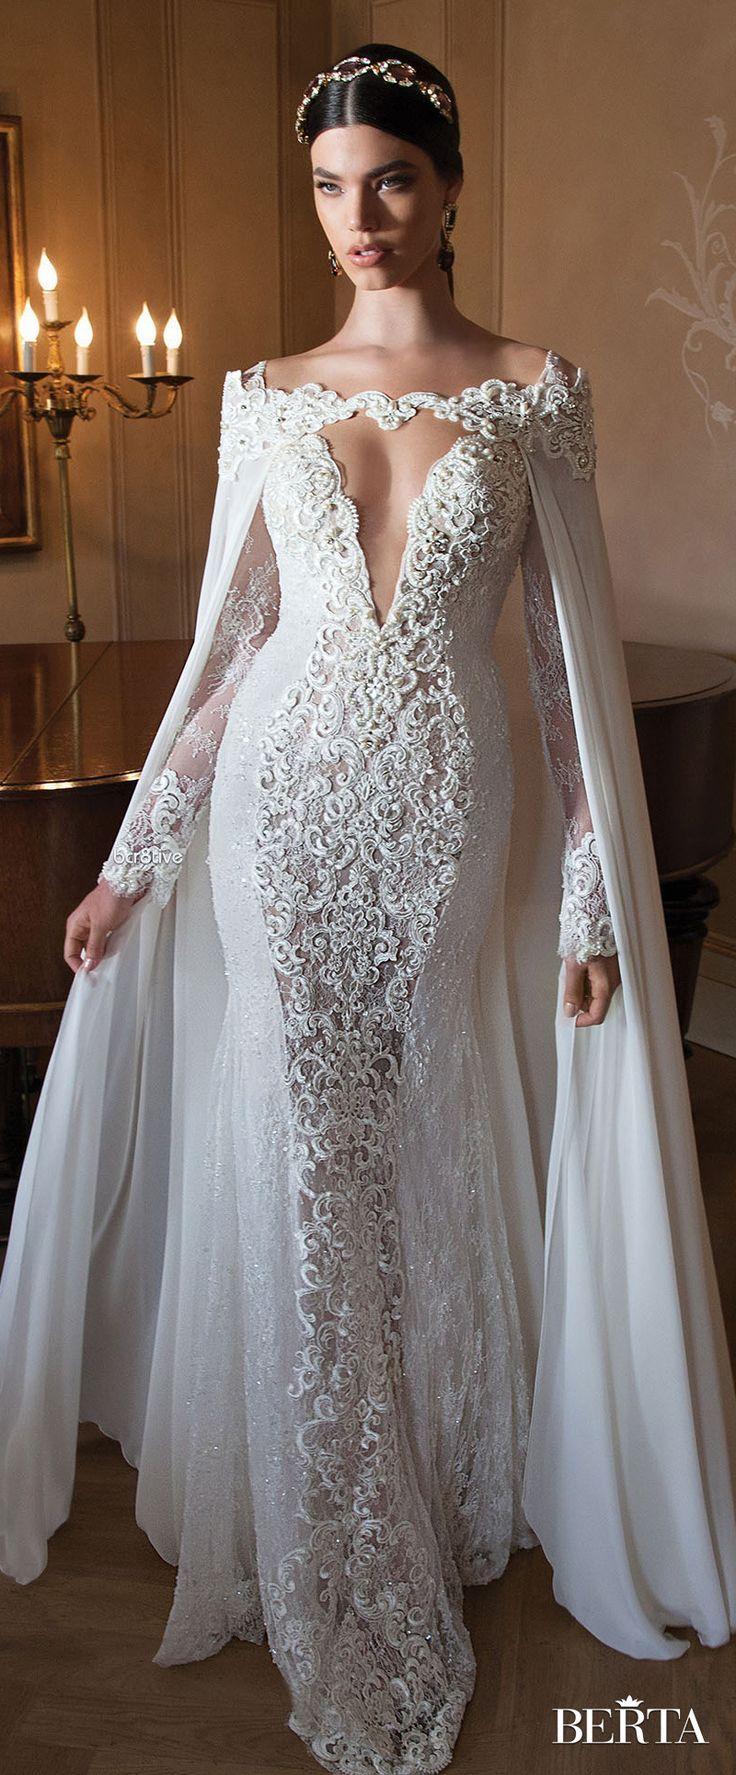 Tiffaiuxvyeaytu Fsℓℓsw Ts ѕyeye Msyaye Cape Wedding Dress Best Wedding Dresses Wedding Dress Long Sleeve